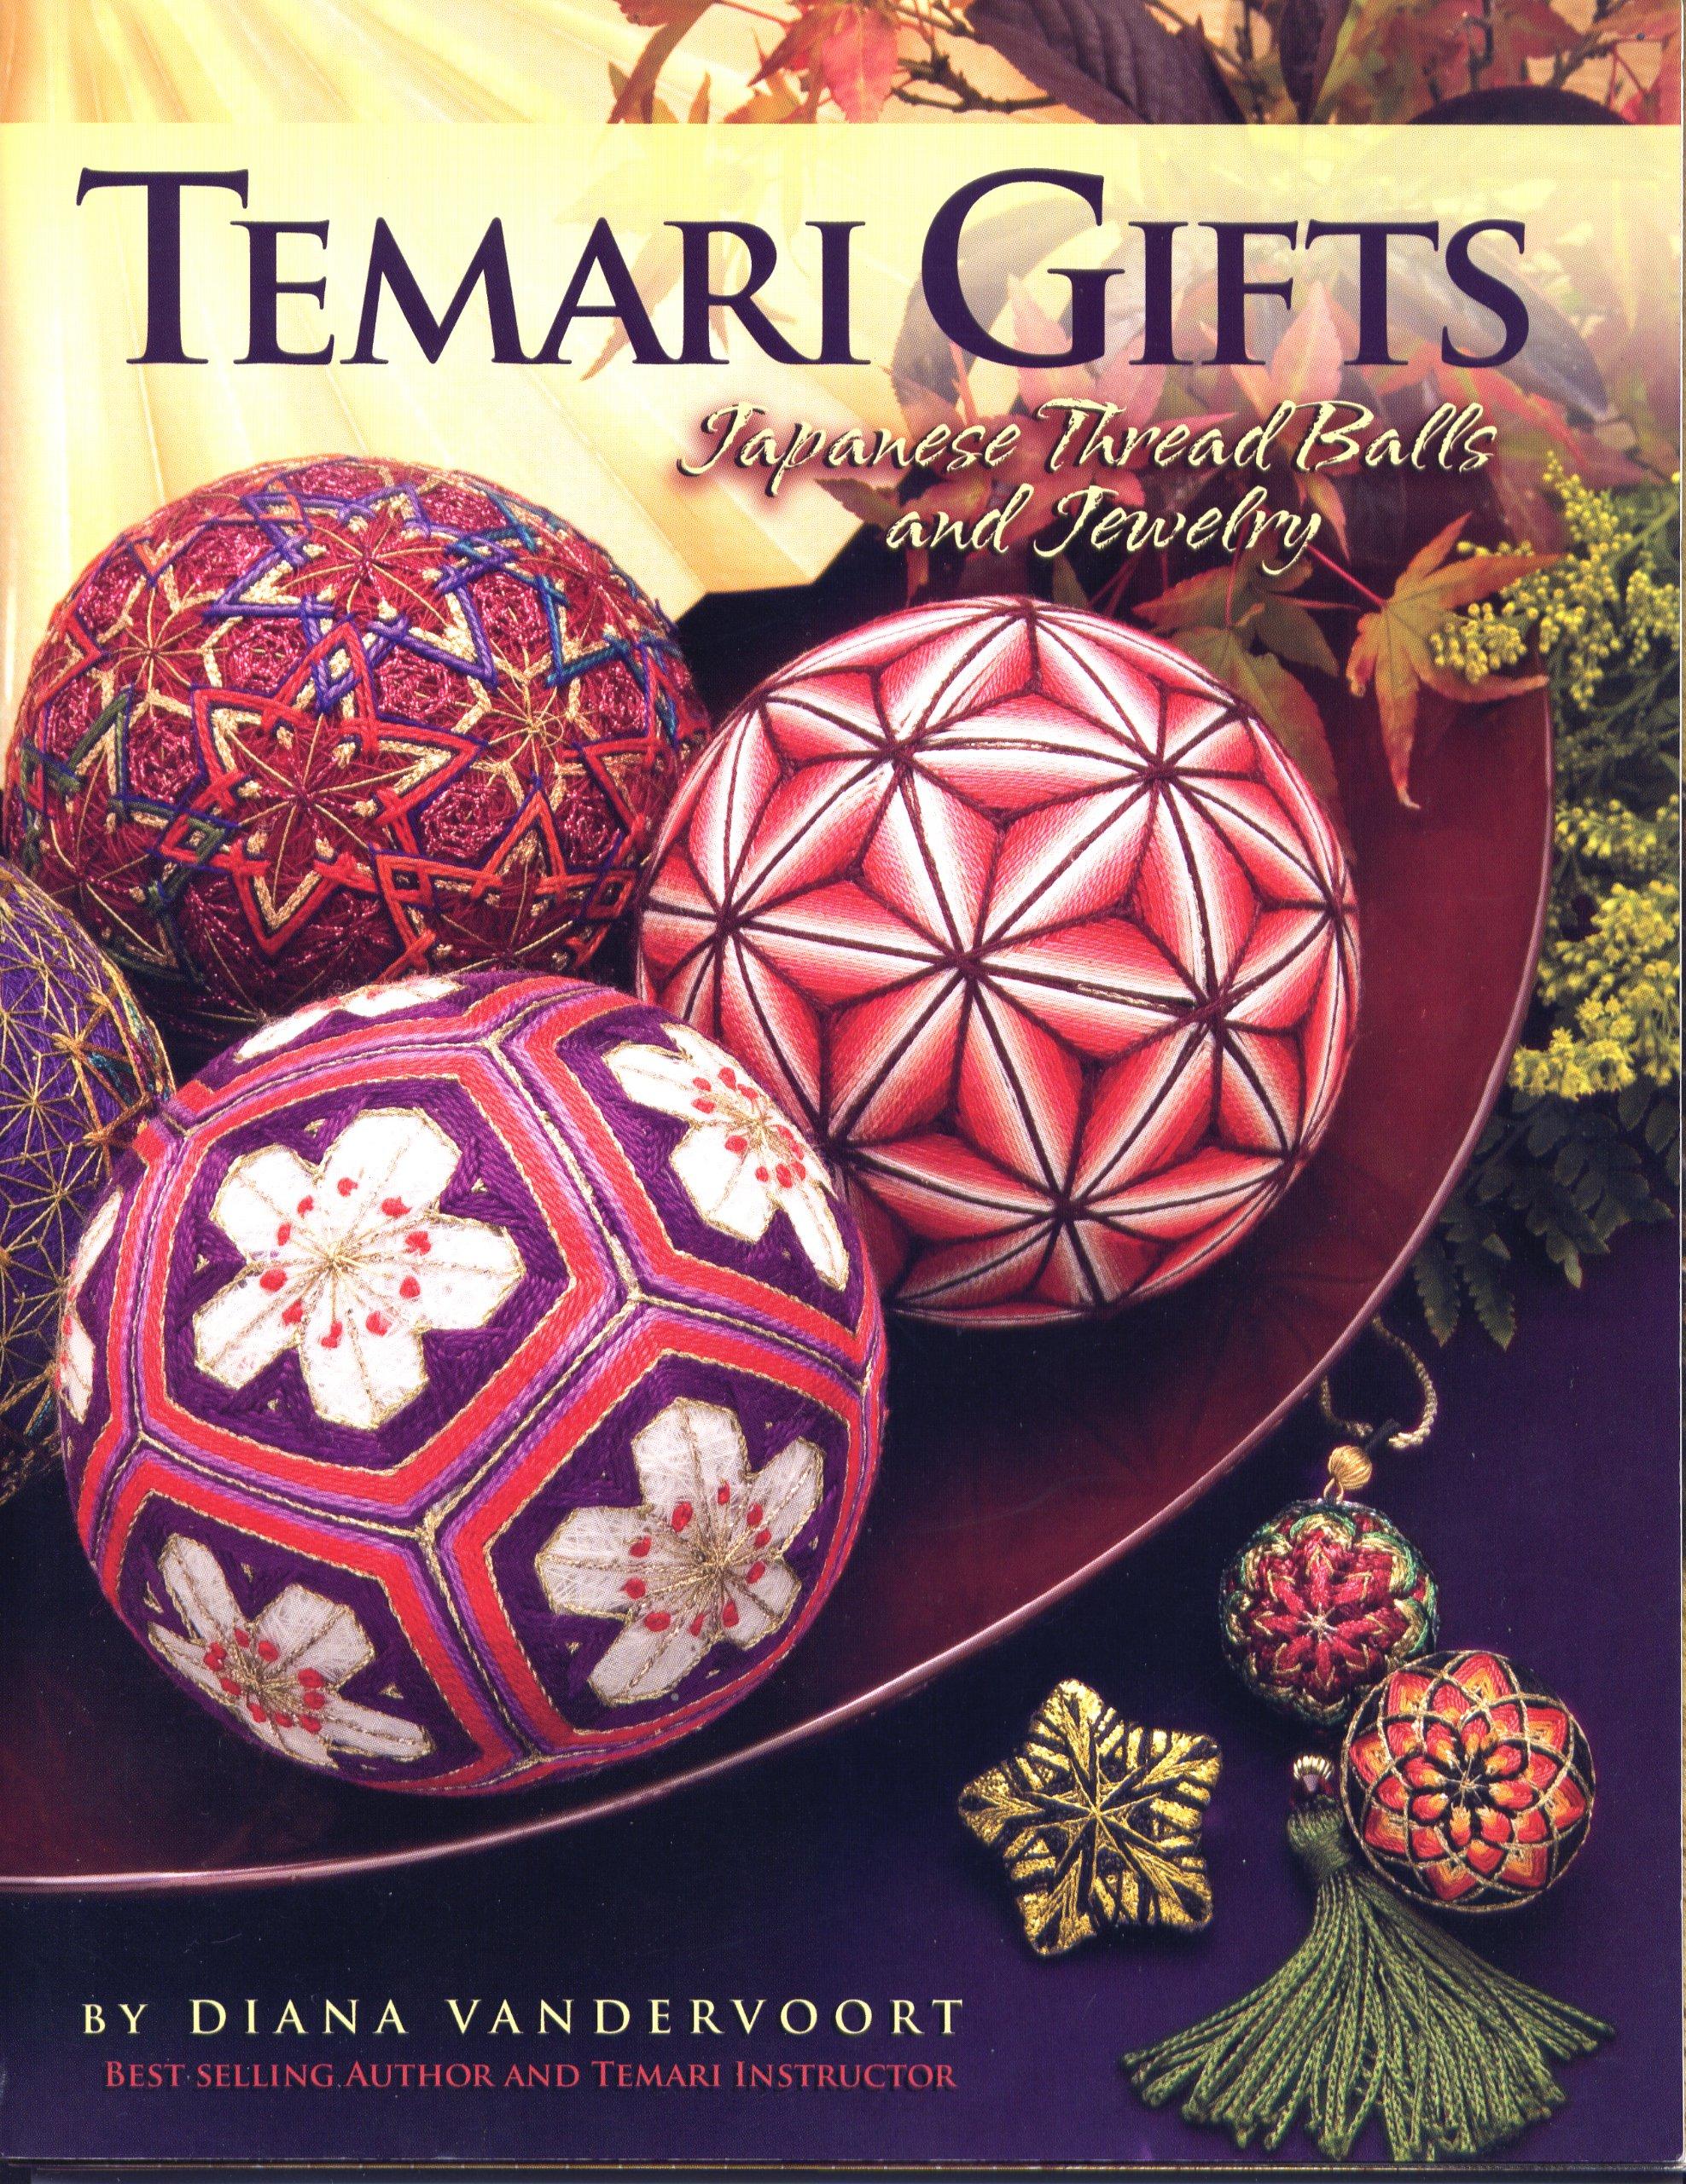 Temari Gifts: Japanese Thread Balls and Jewelry: Diana Vandervoort ...